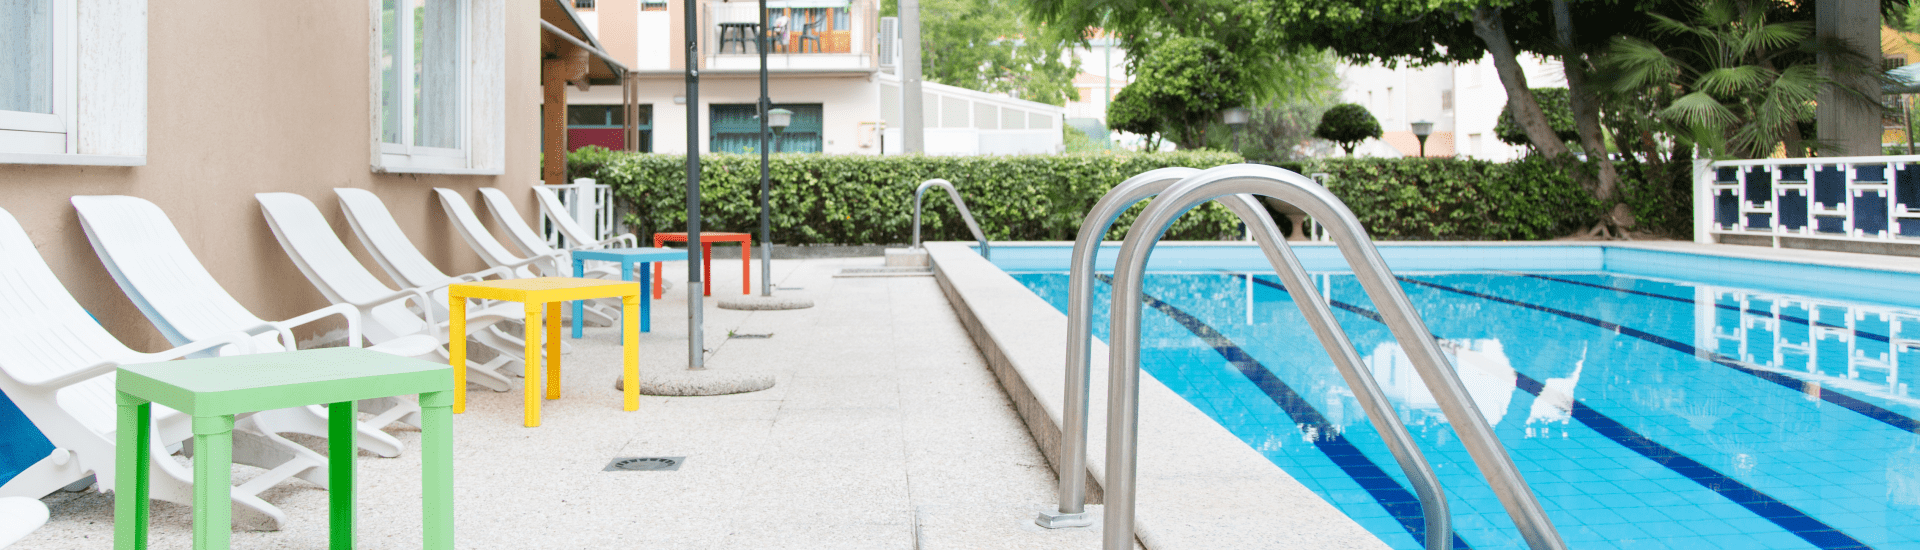 piscina_hotel_saint_tropez_pineto-min